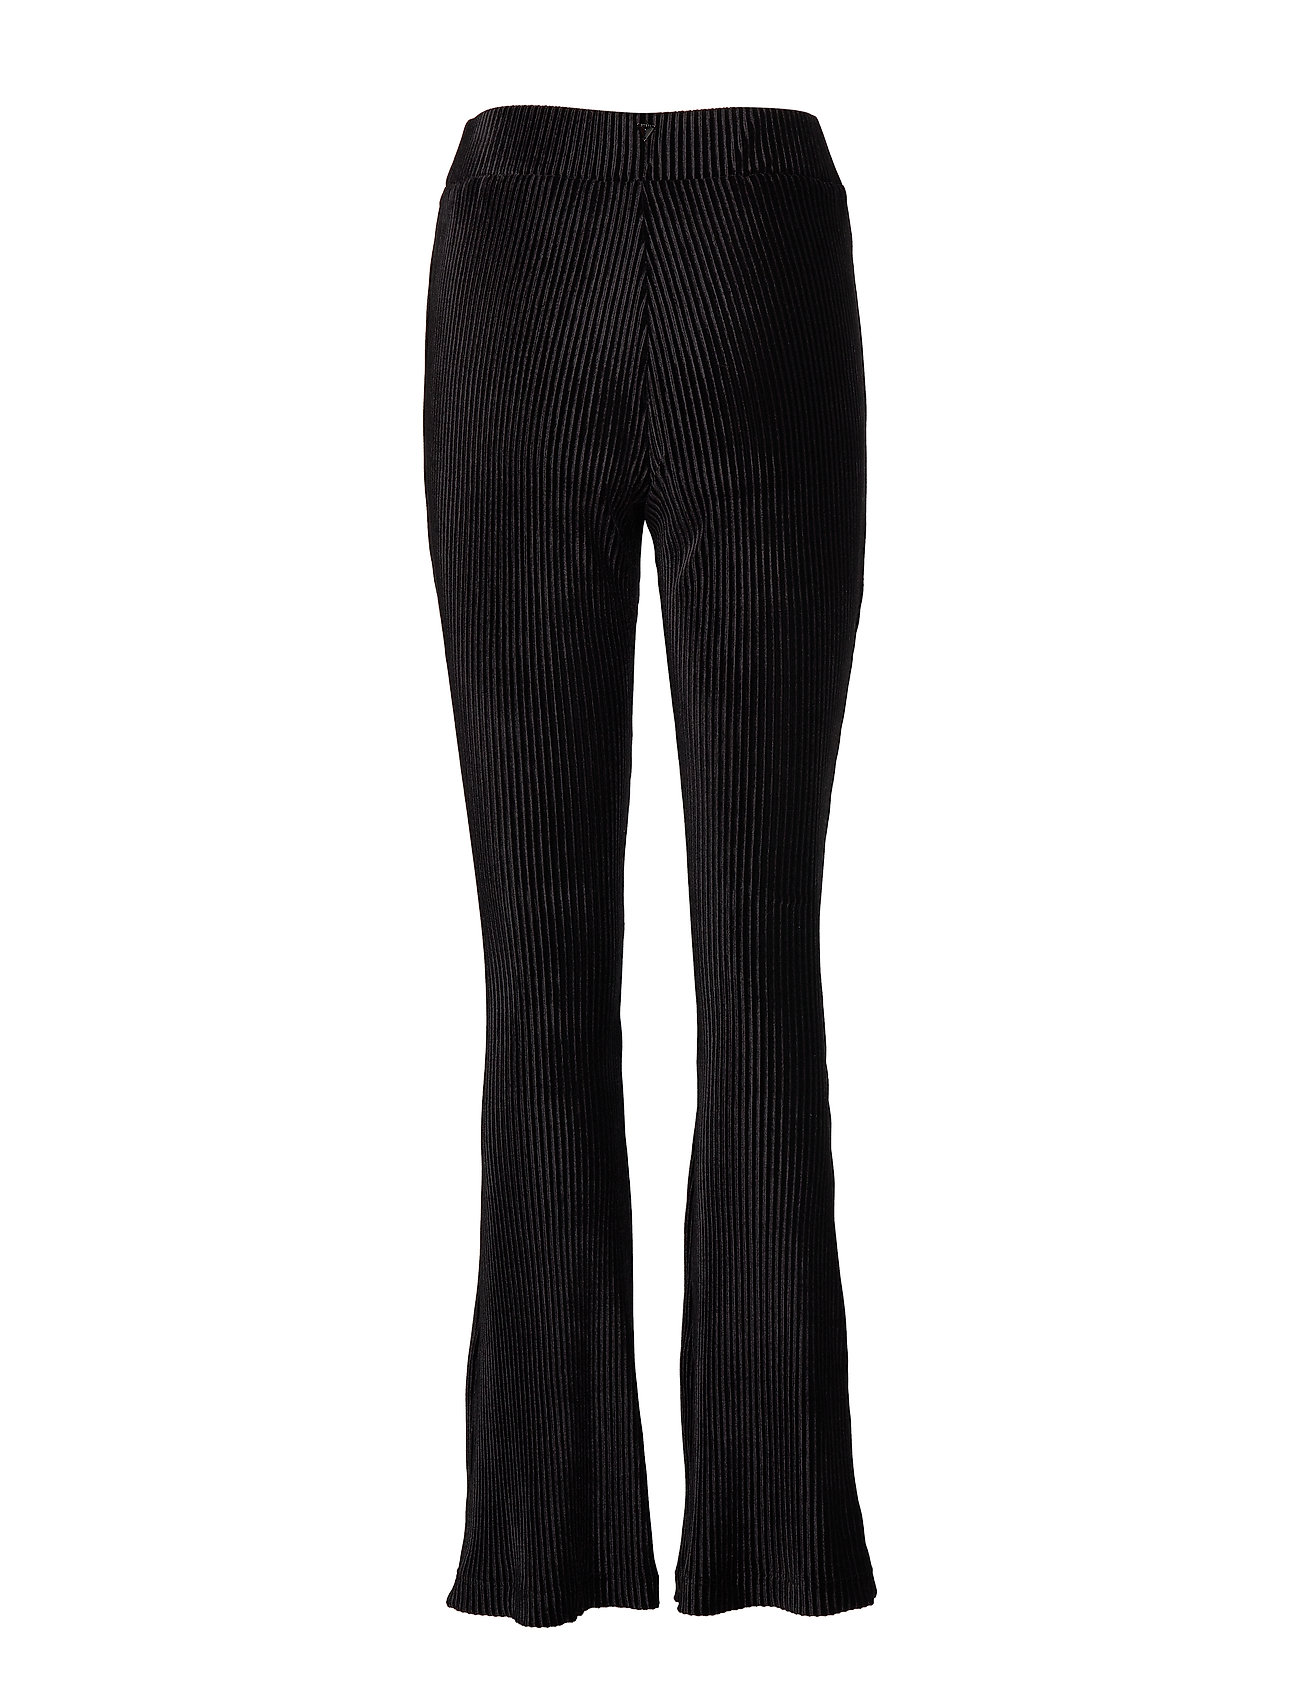 A996Guess Amber Amber Pantsjet Black Pantsjet Amber Black Pantsjet A996Guess A996Guess Jeans Black Jeans SqUpzMV